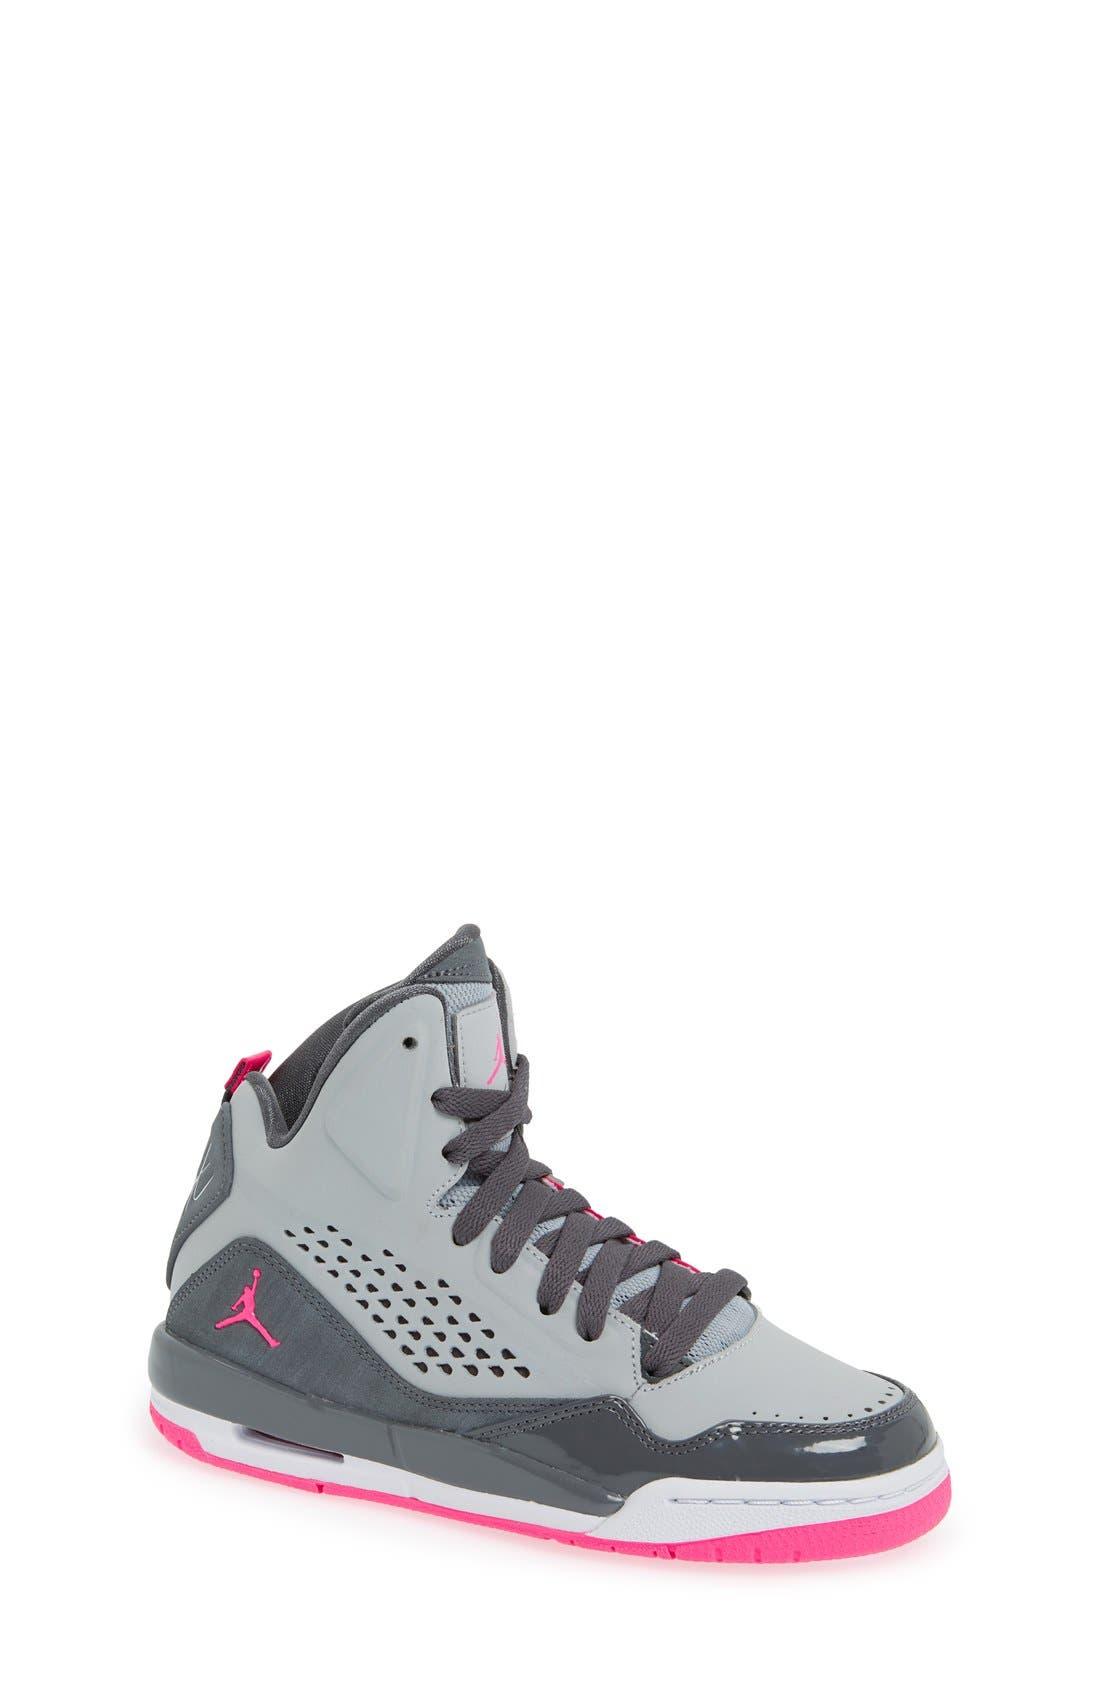 Alternate Image 1 Selected - Nike 'Jordan SC3' Basketball Shoe (Big Kid)